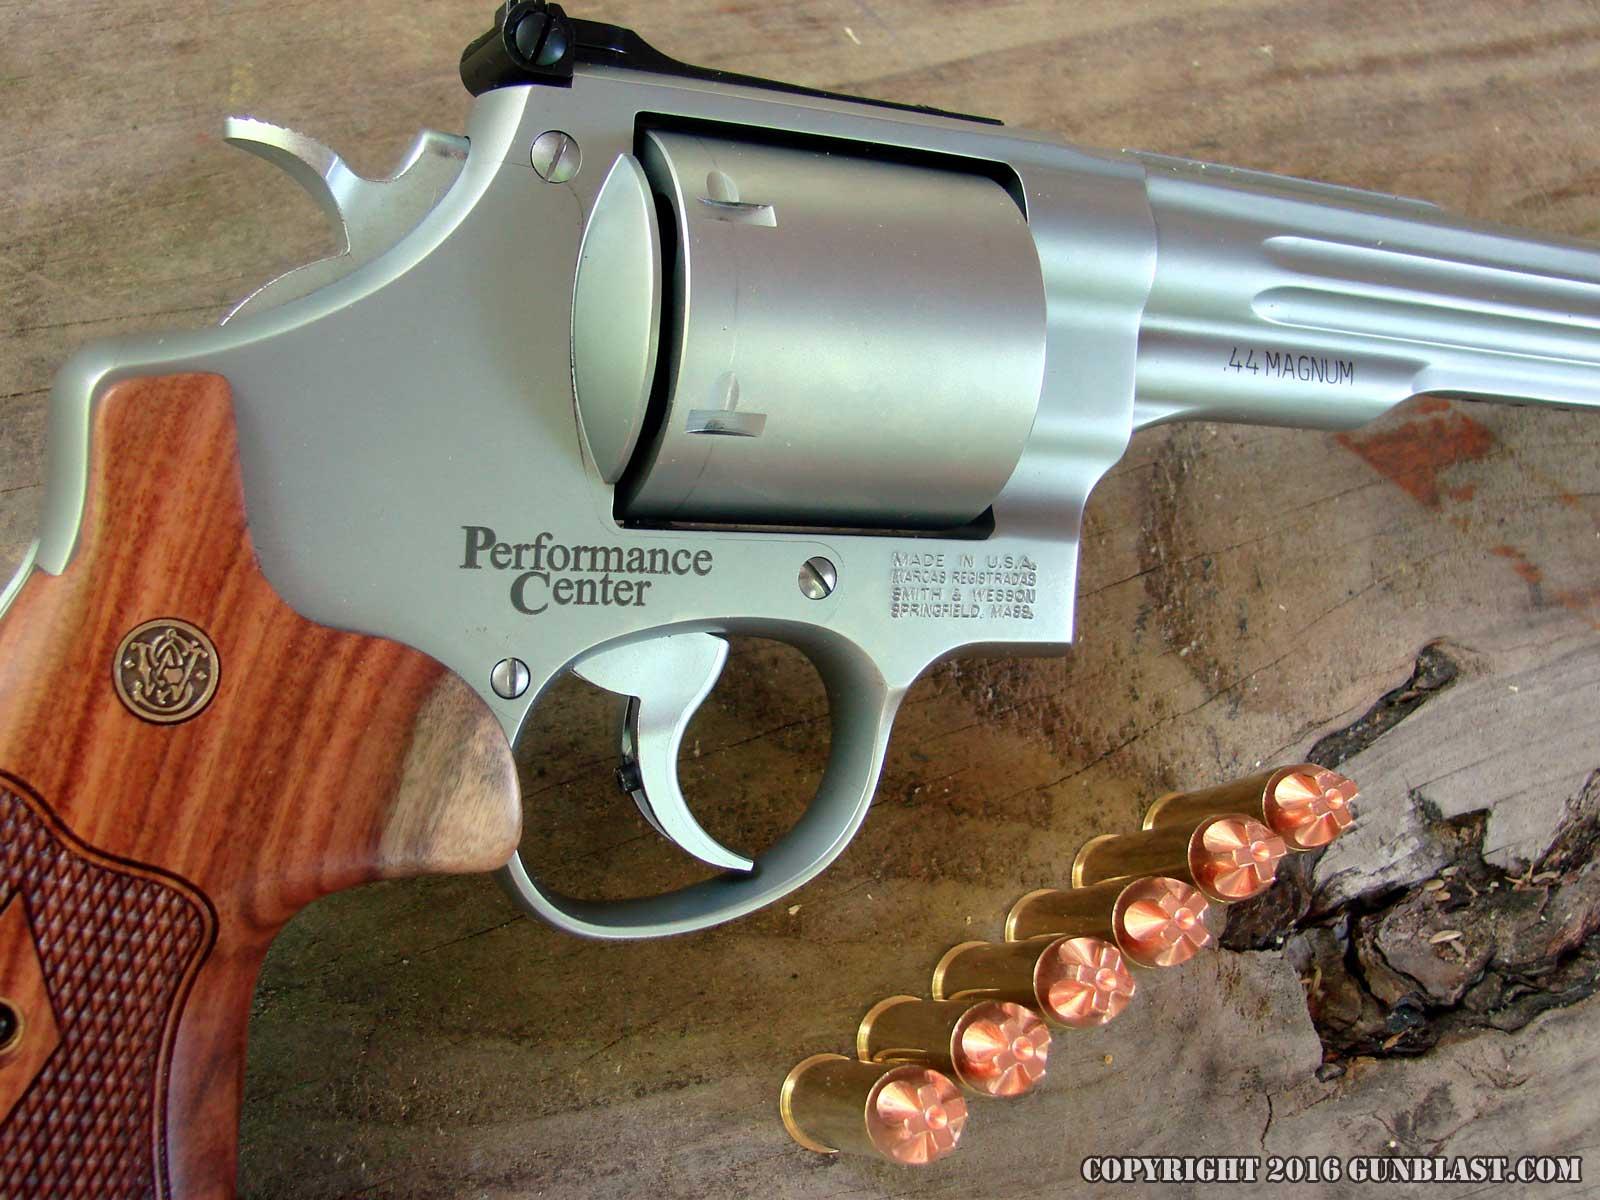 Smith & Wesson Performance Center 629 Hunter 44 Magnum Revolver